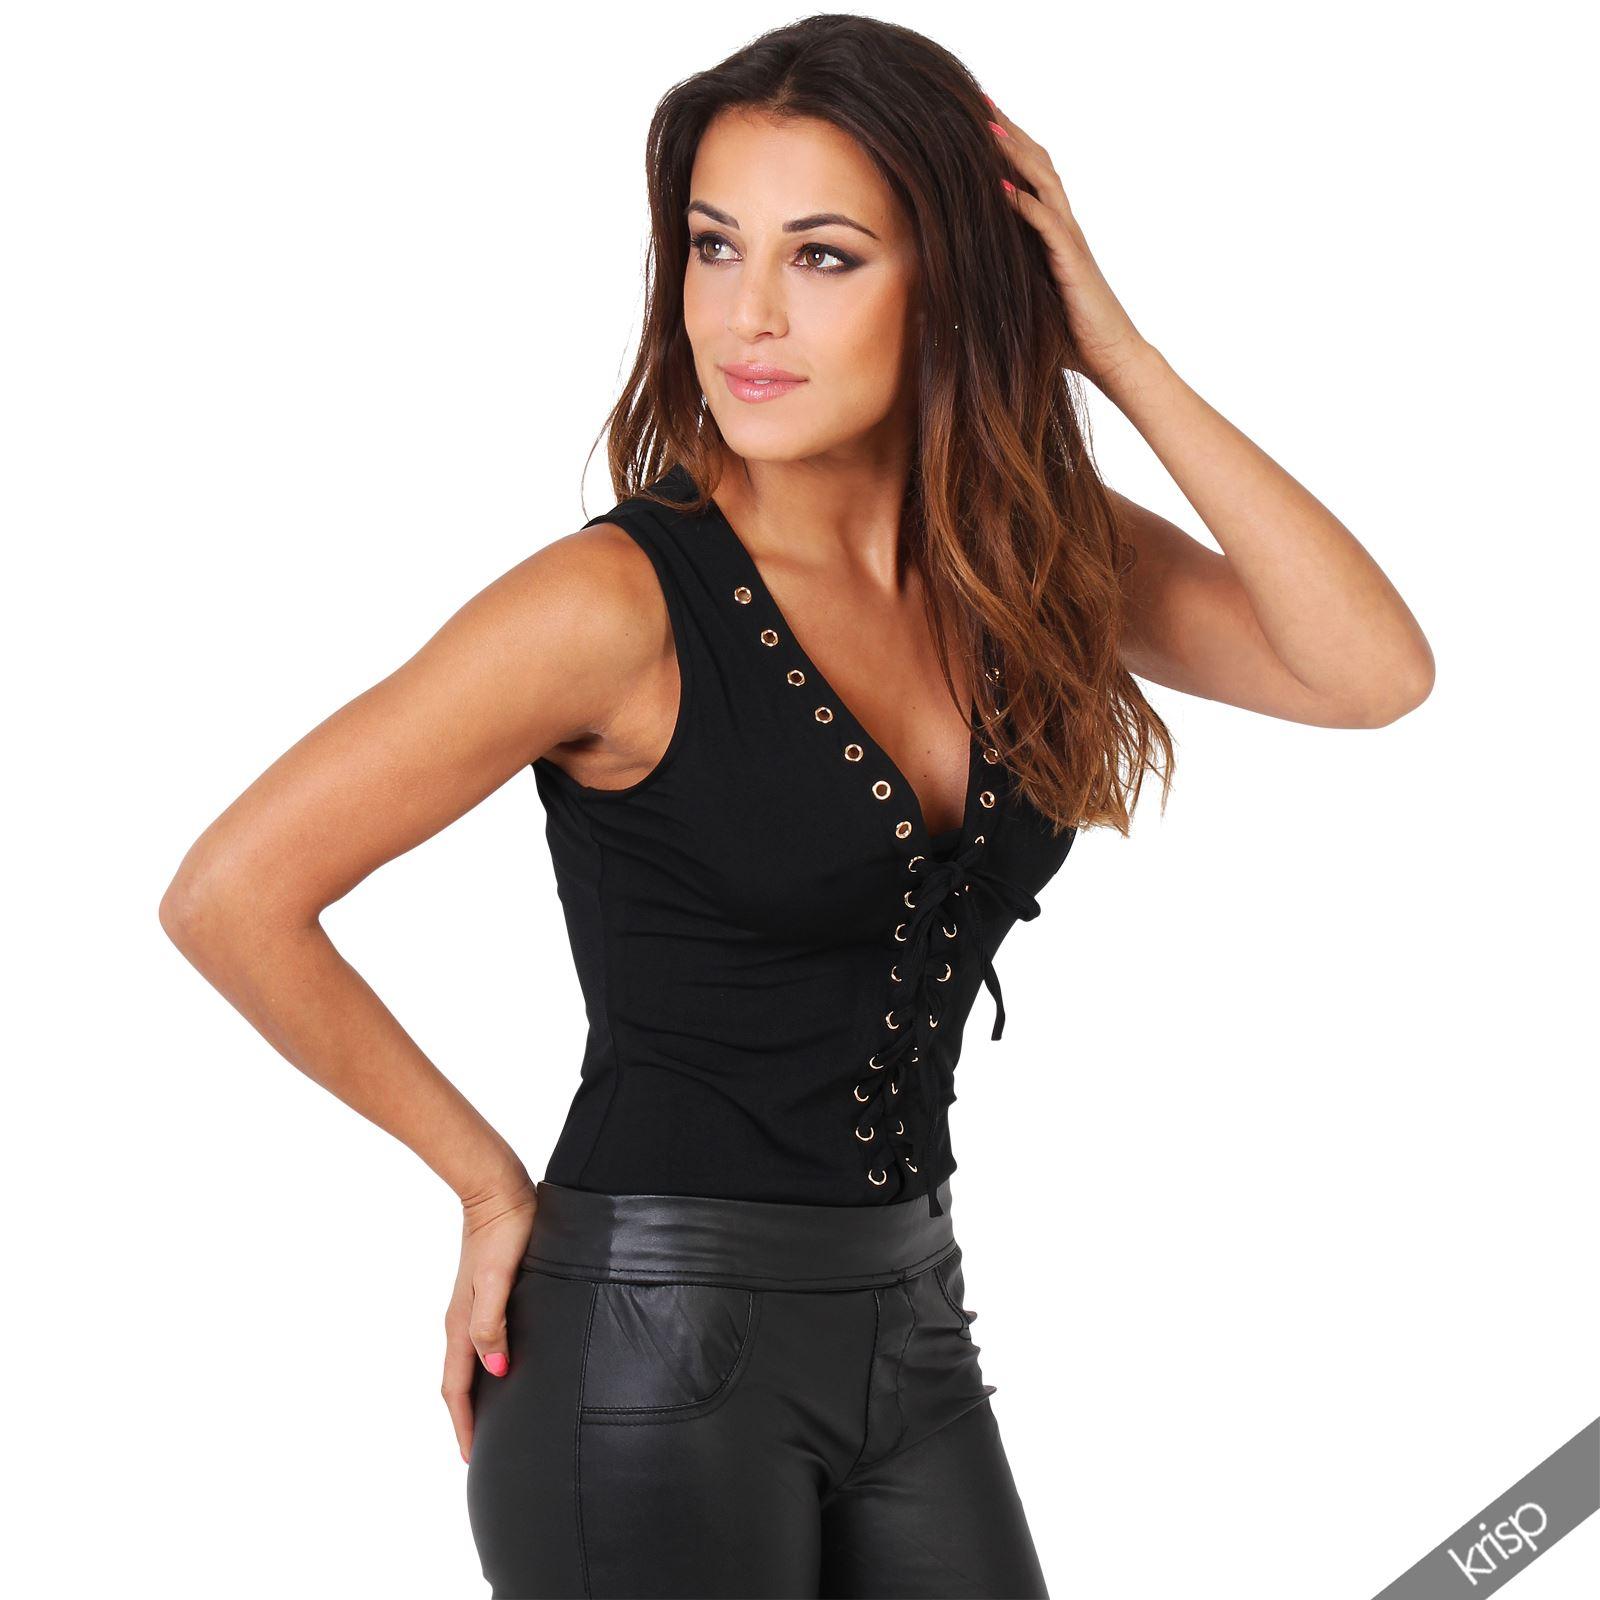 femme body top justaucorps sexy d collet plongeant zip dor manche r sille ebay. Black Bedroom Furniture Sets. Home Design Ideas